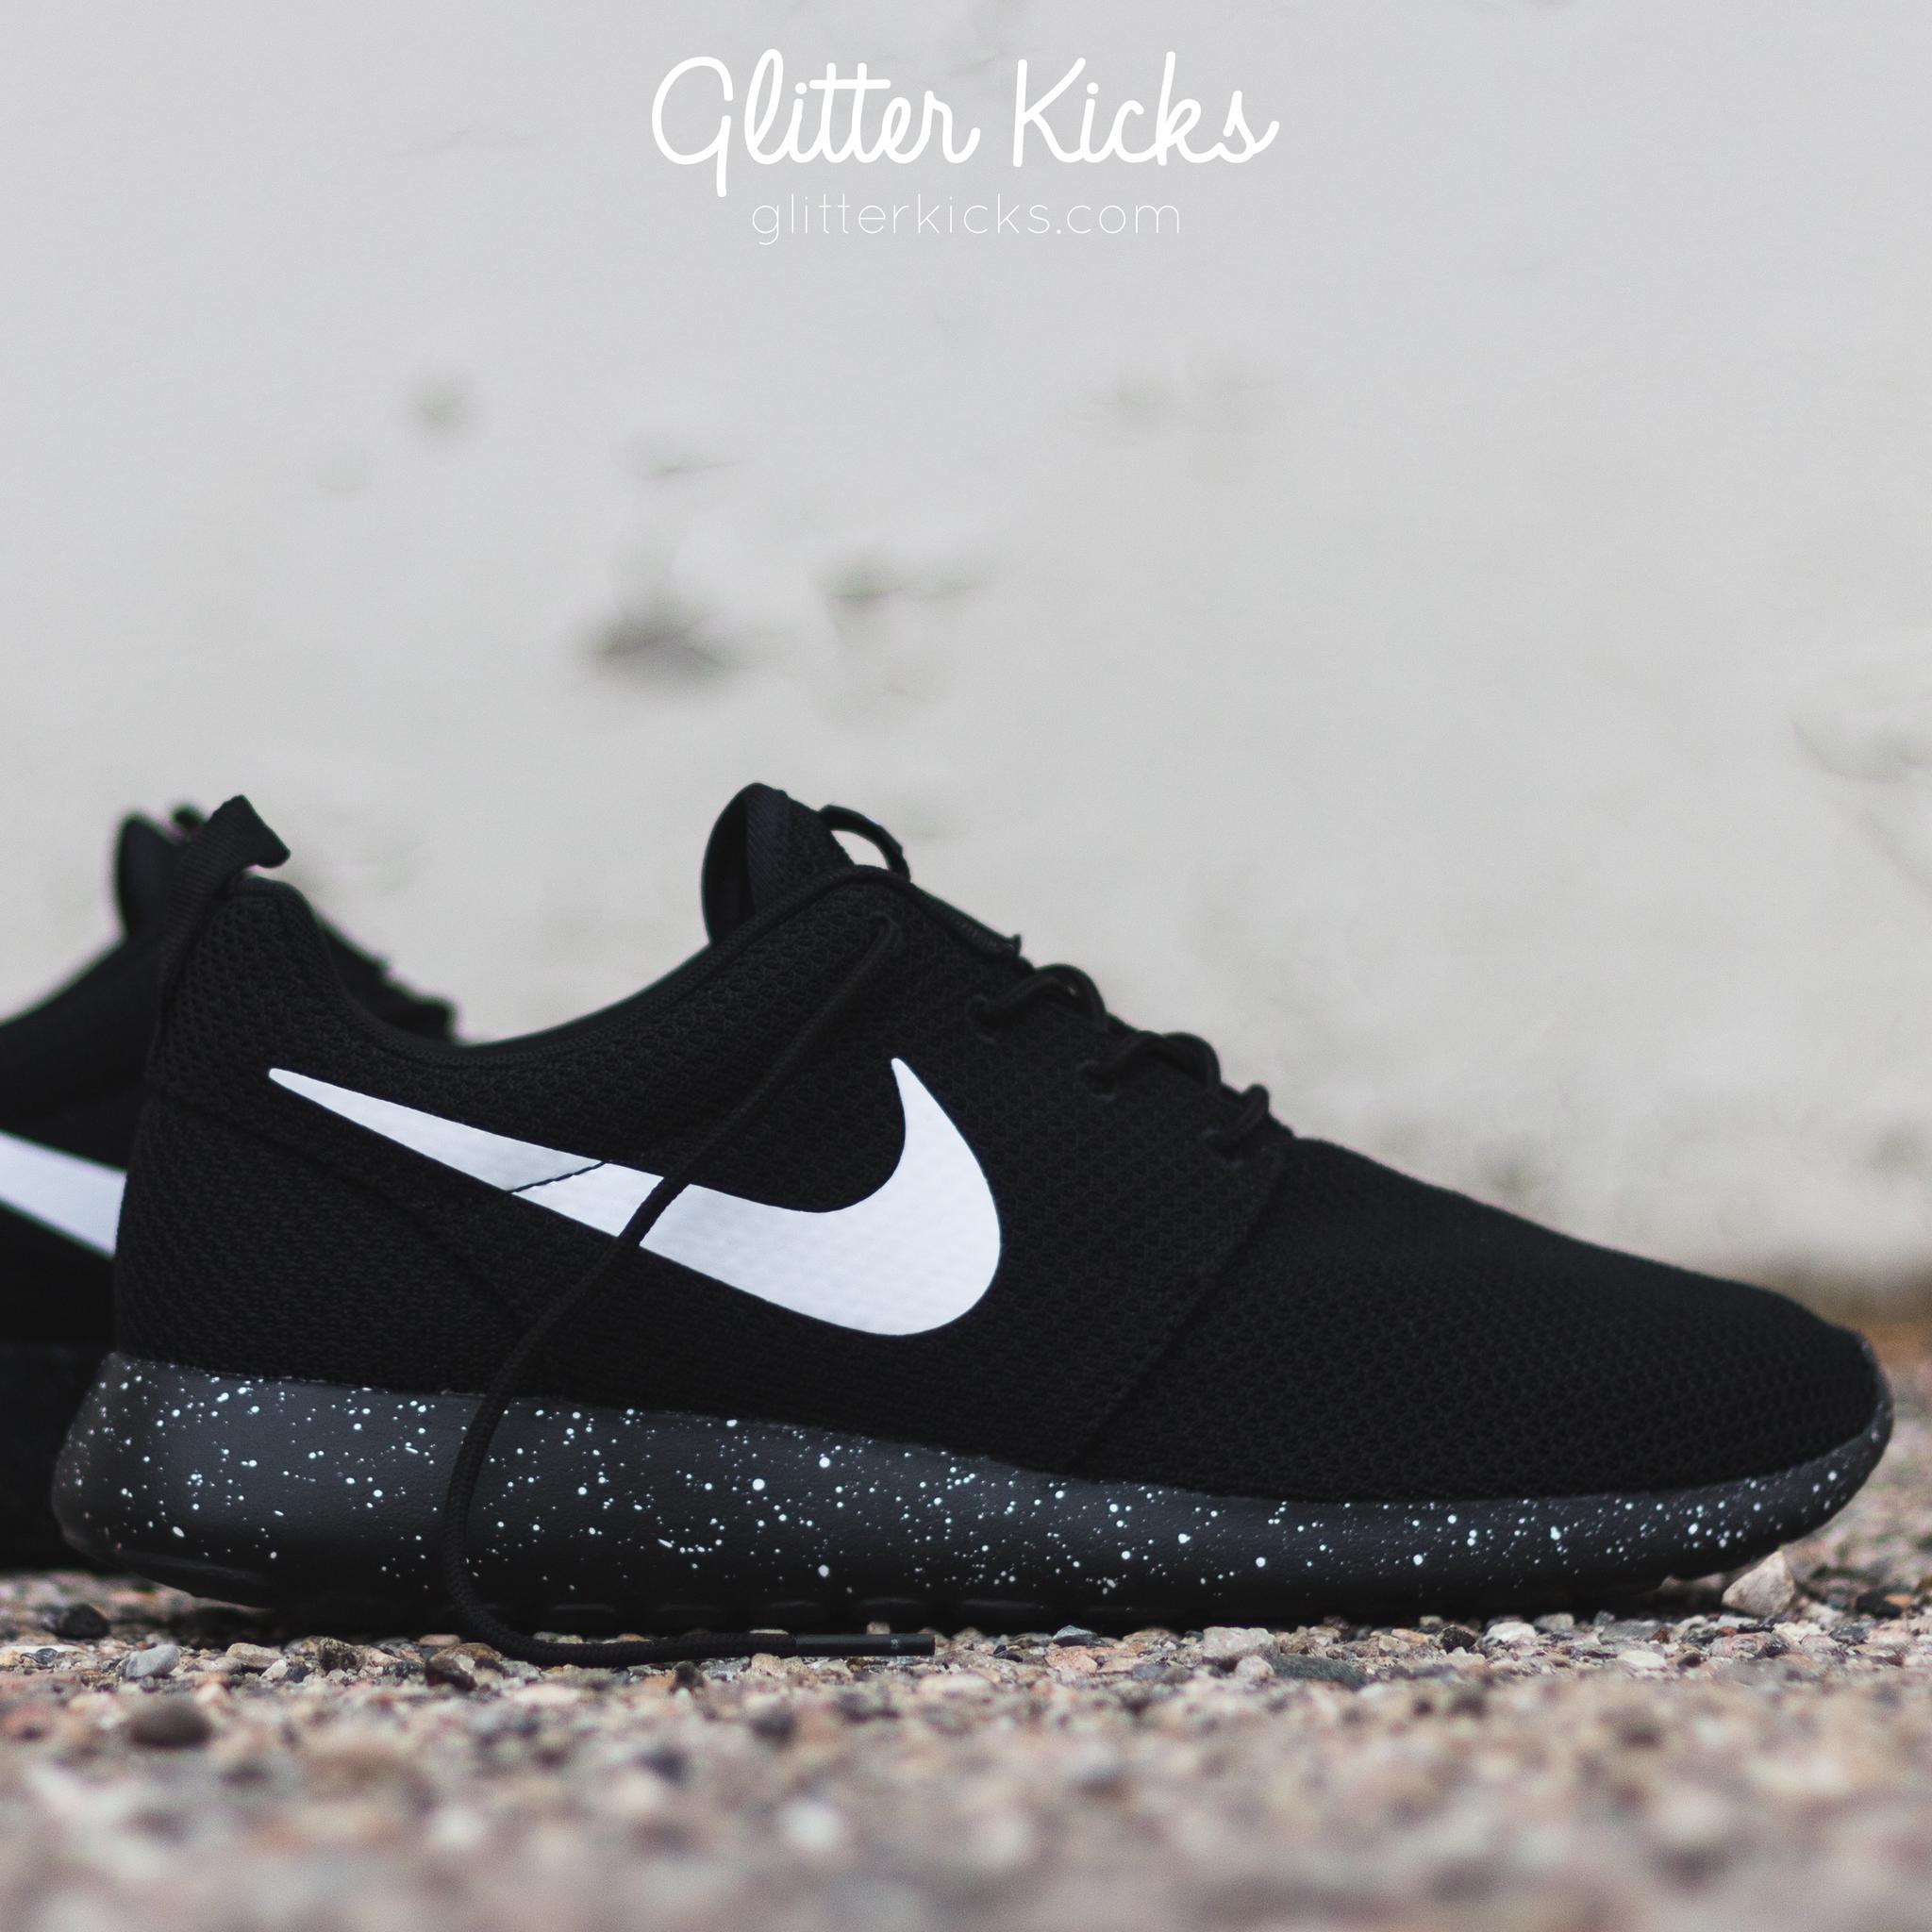 ... Nike Roshe One Customized by Glitter Kicks - Oreo Black White Paint  Speckle ... 9ae91efca